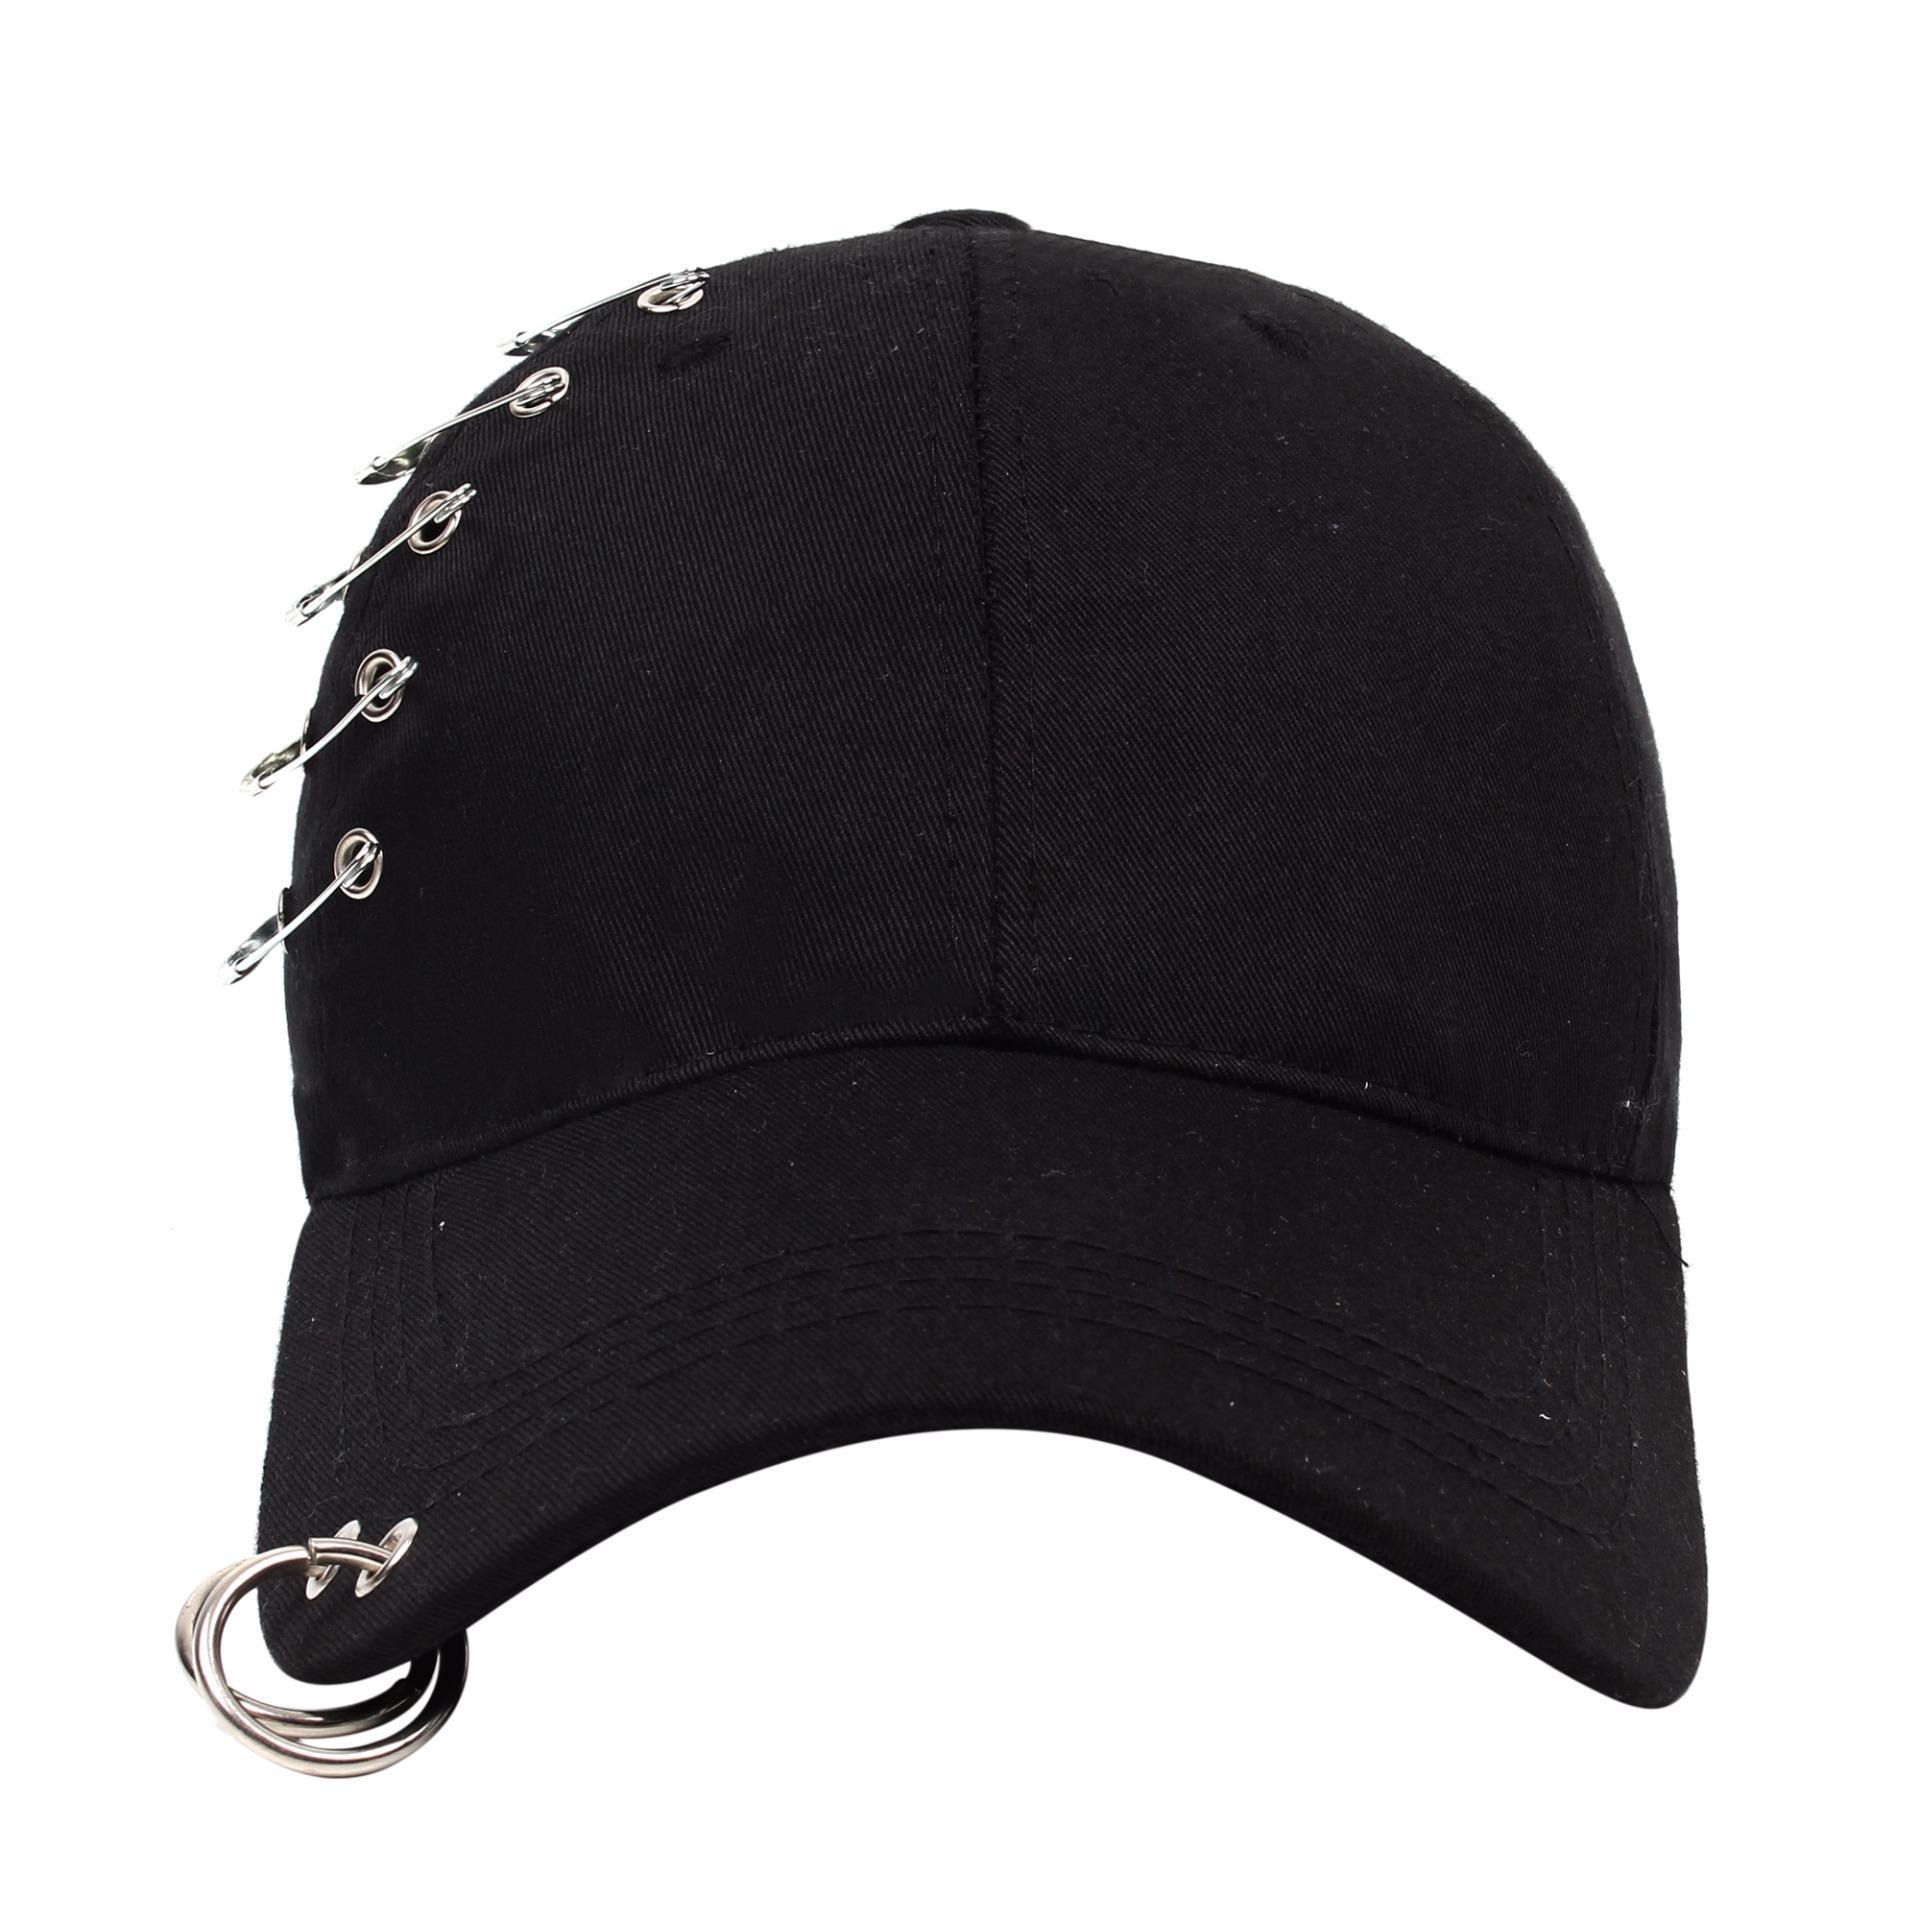 ... ayat yang sama klip topi baseball topi (Tali mauve abu. Source · Cap City Korean Style with 5 Pins and 2 Ring Pierce Design Baseball .